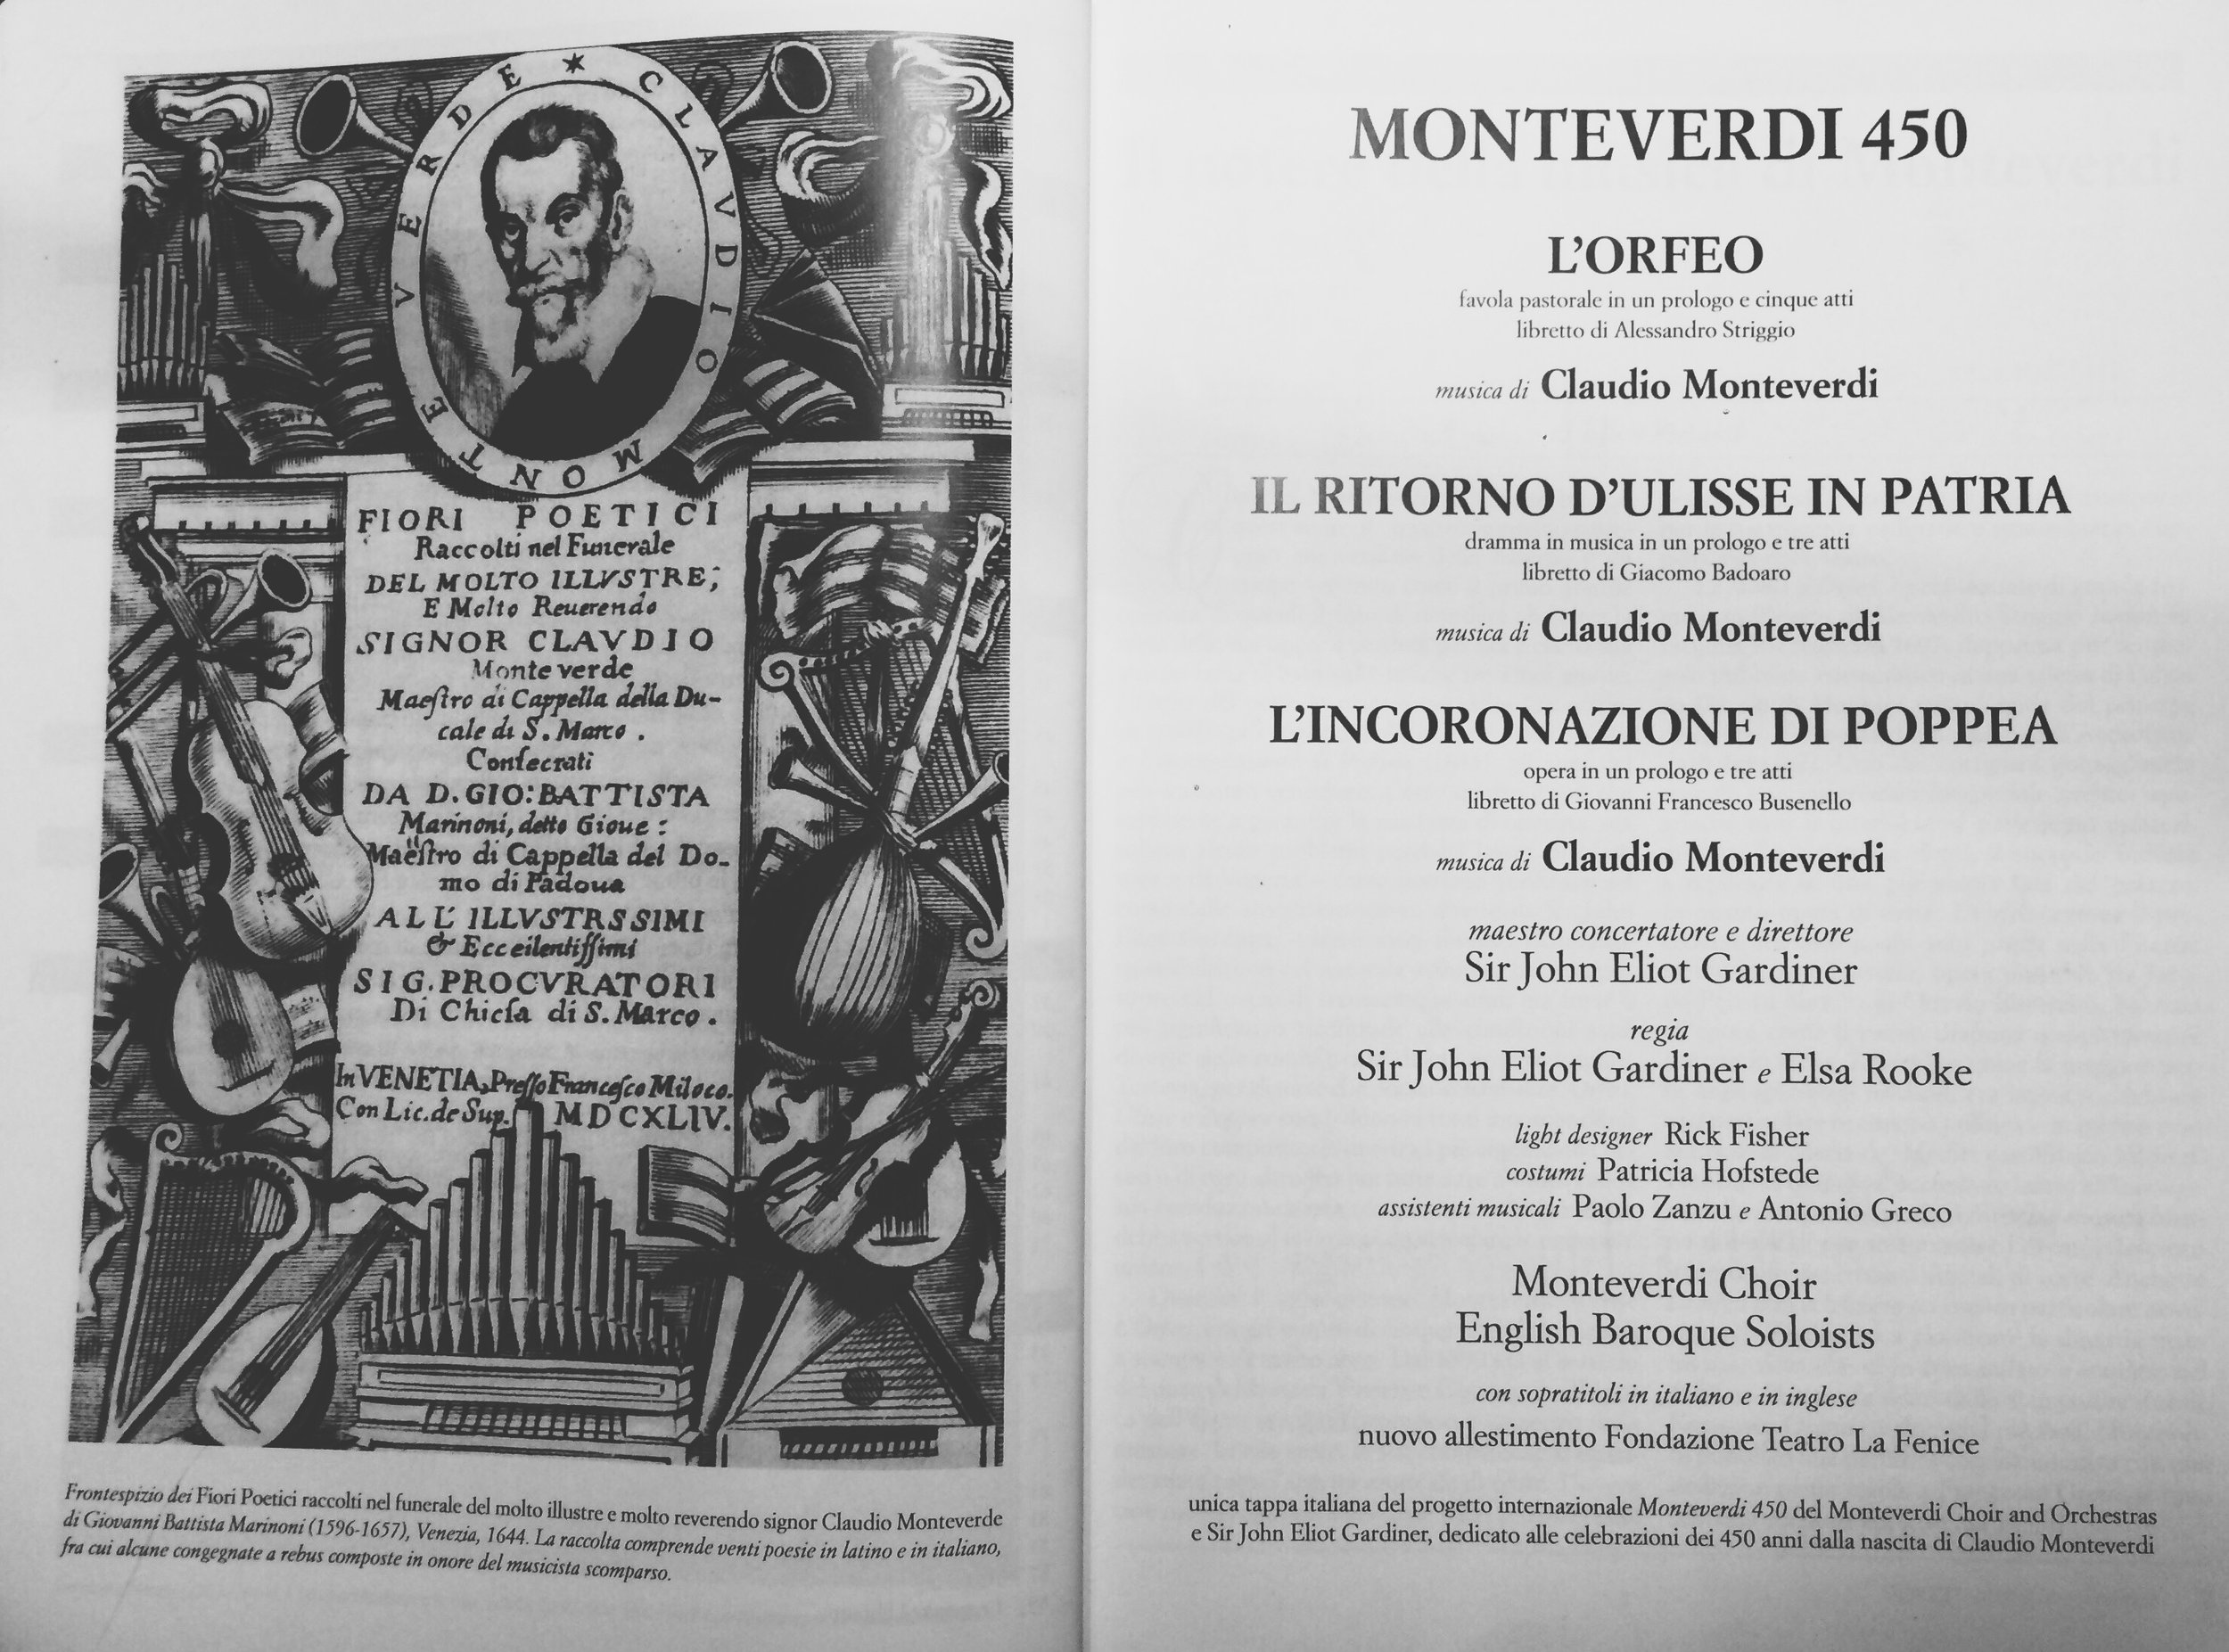 Monteverdi Choir and Orchestras - Sir John Eliot Gardiner - Costumi ; Patricia Hofstede